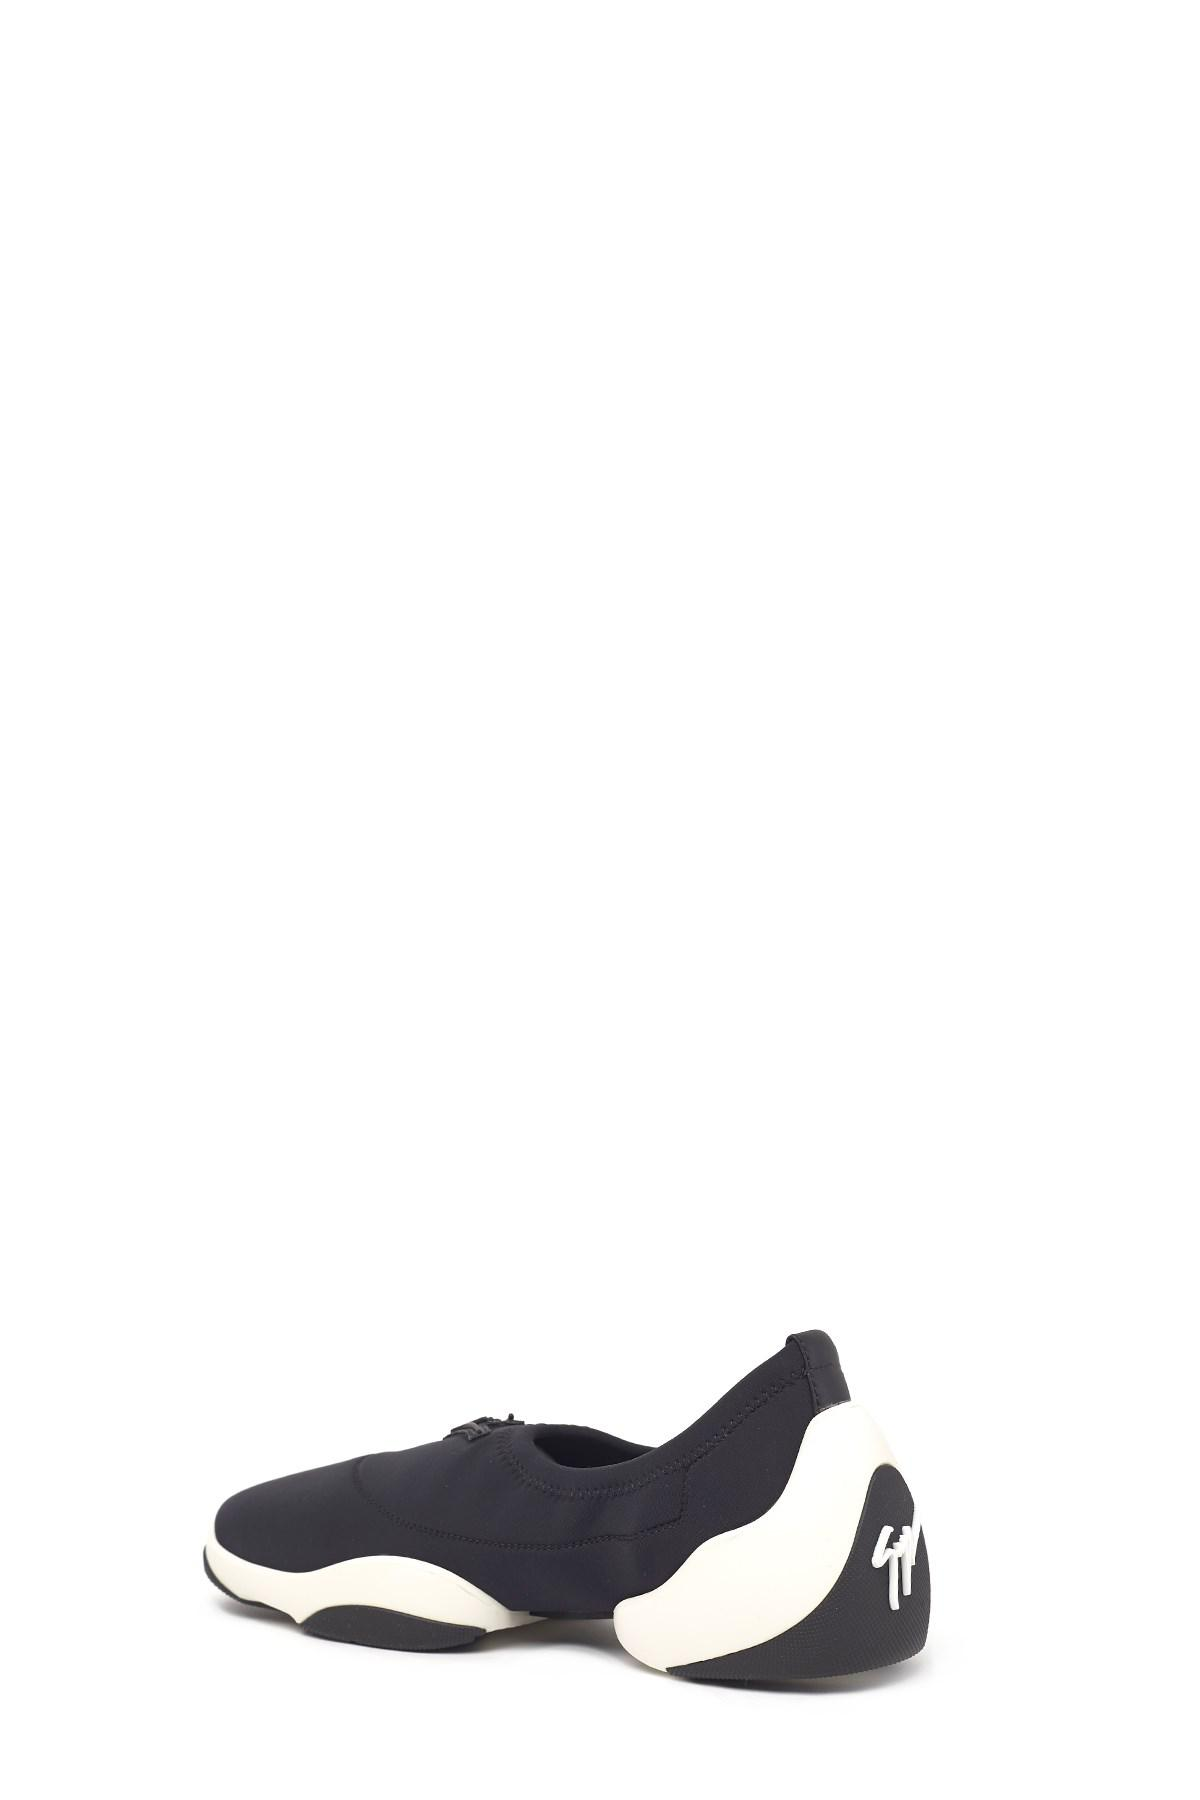 Lyst - Giuseppe Zanotti  carlito  Sneakers in Black d4e9ba92bb9